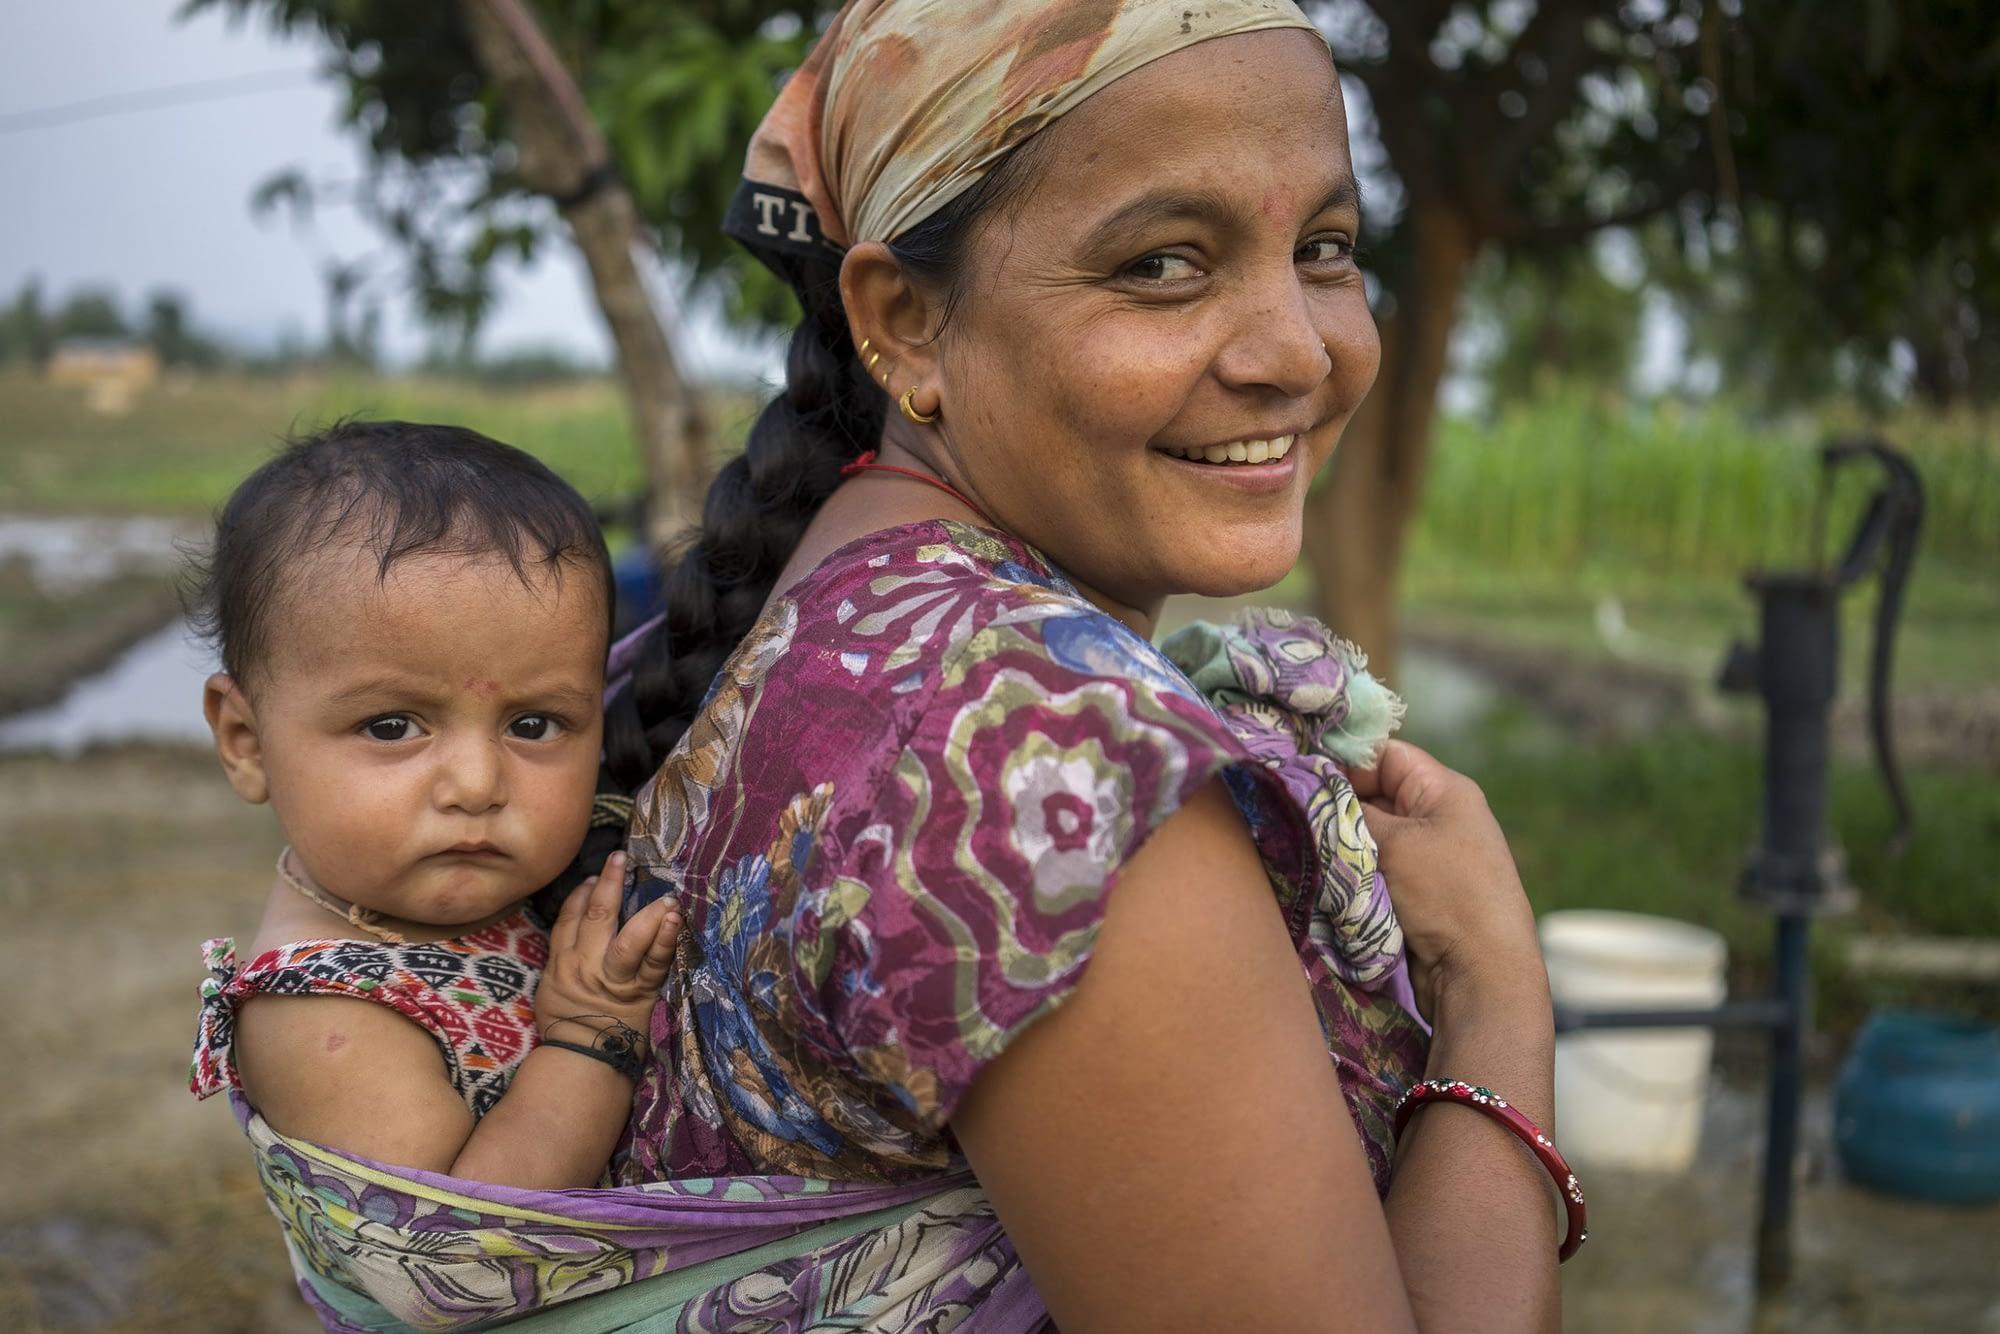 Farmer Bhima Bhandari returns home after field work carrying her 7-month-old son Sudarsan on her back in Bardiya, Nepal. (Photo: Peter Lowe/CIMMYT)